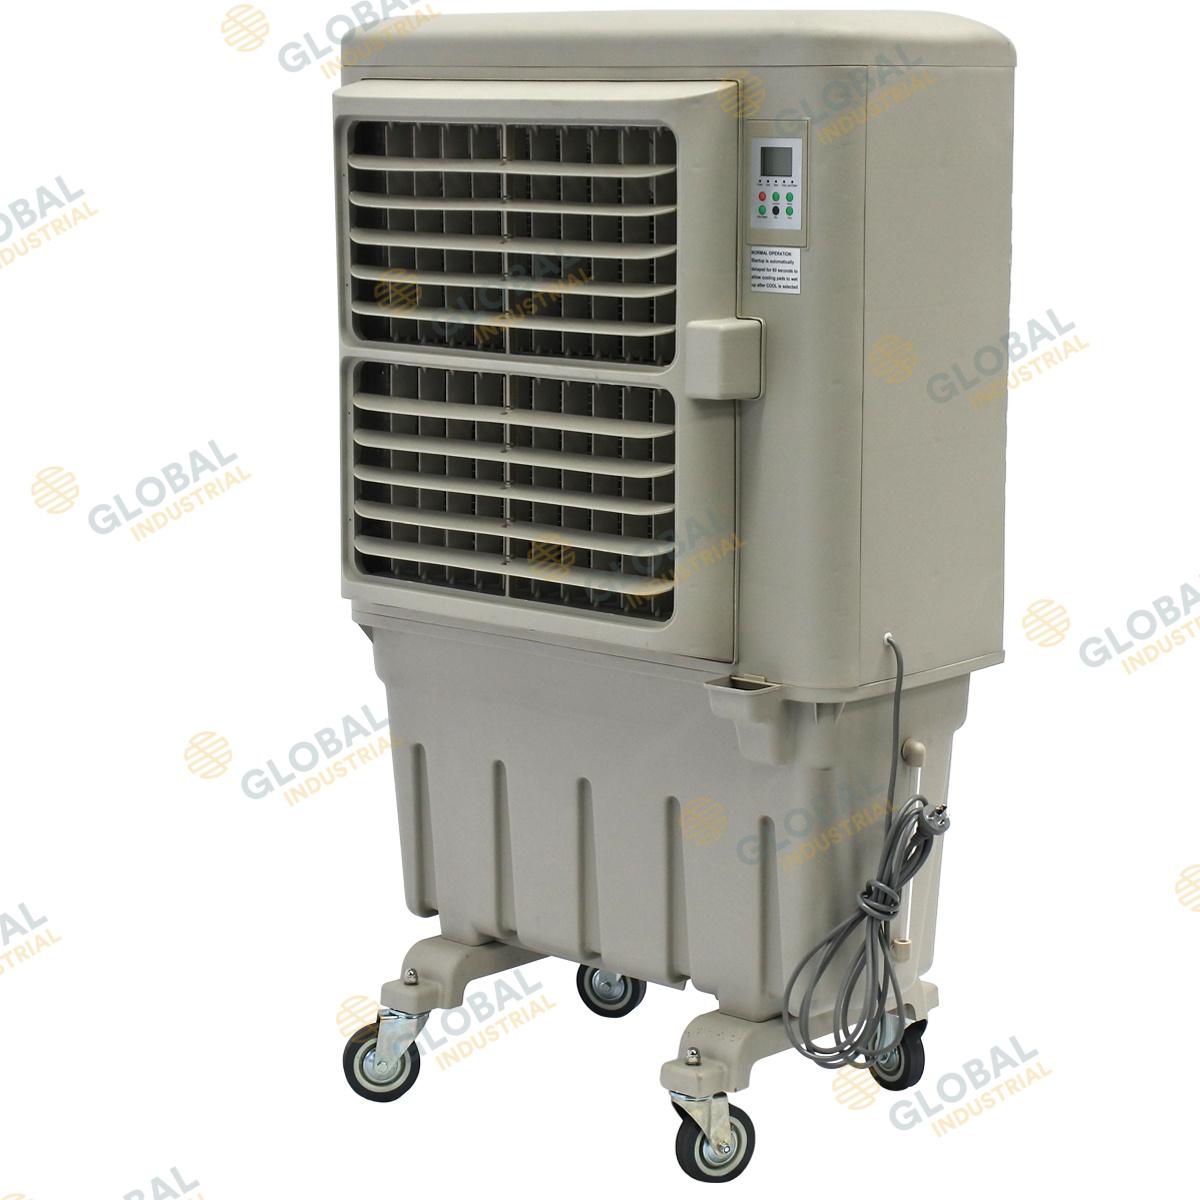 Evaporative Condensing Unit : Evaporative portable air conditioning unit small but